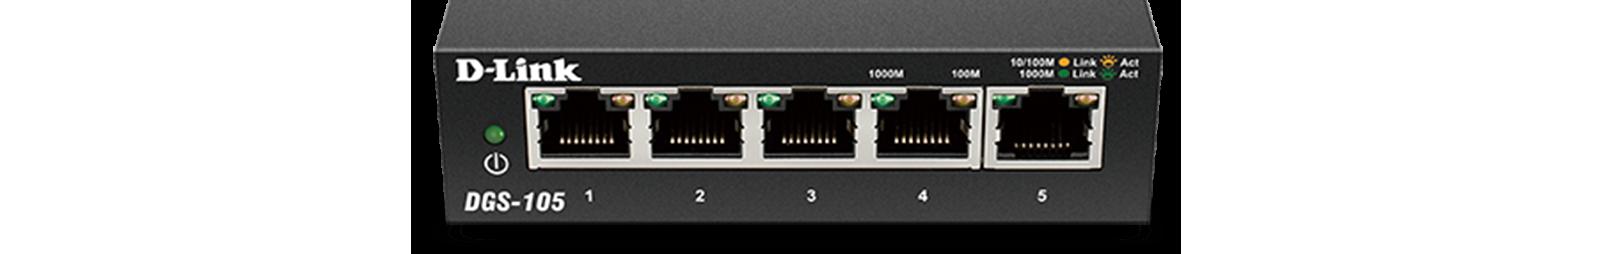 D-Link DGS-105 5 Port Gigabit Unmanaged Metal Desktop Switch